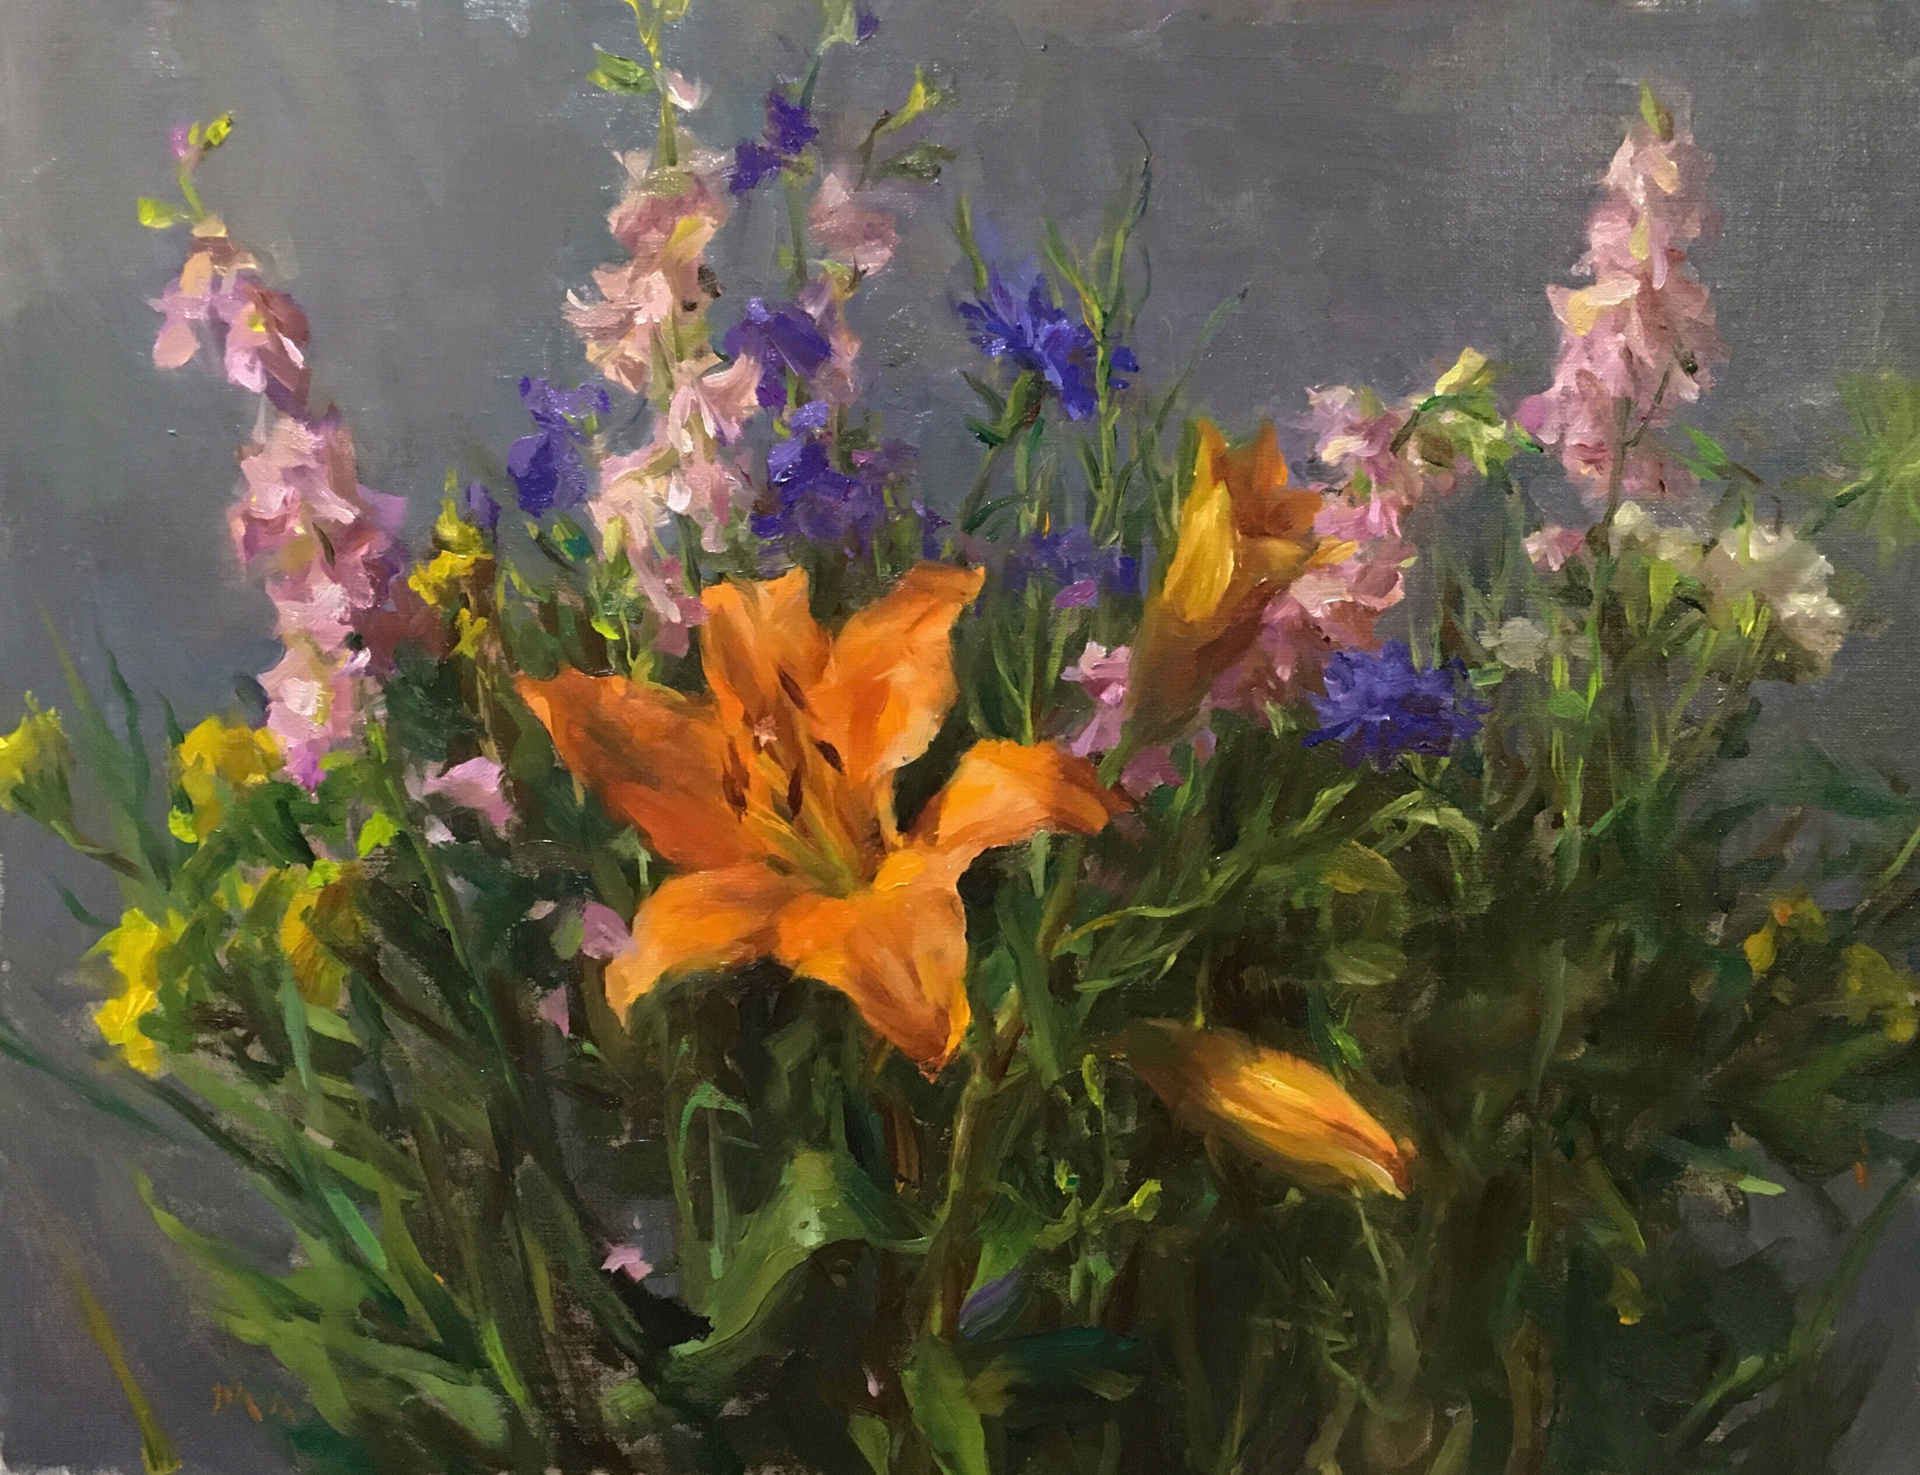 Spring Harmony by Kyle Ma